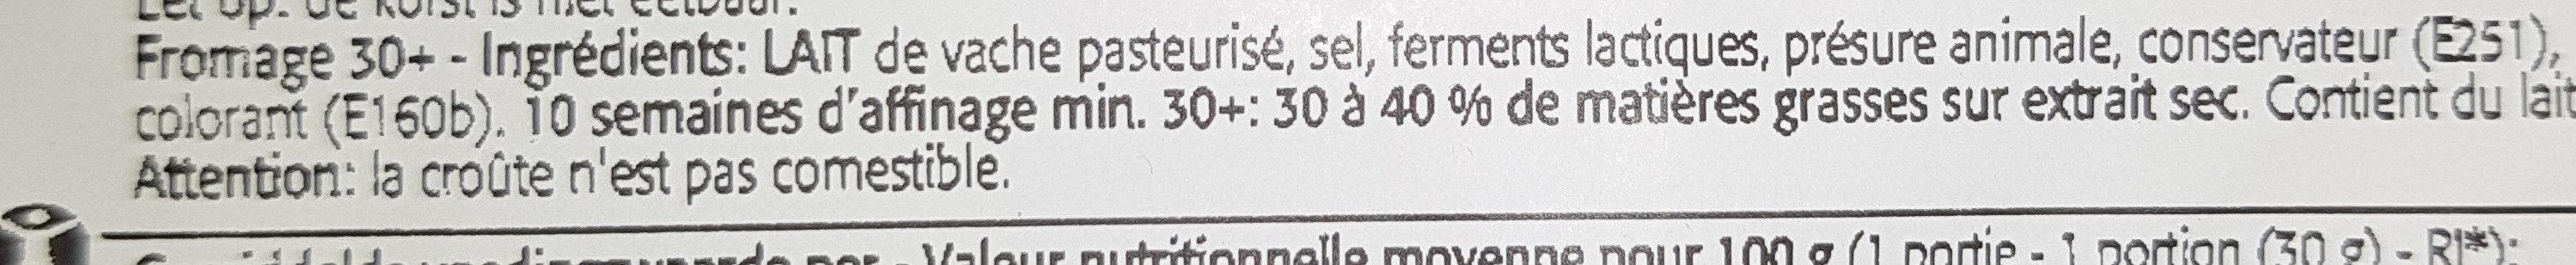 Noord Hollander Light 21% - Jeune Gouda reposé - Ingrediënten - fr